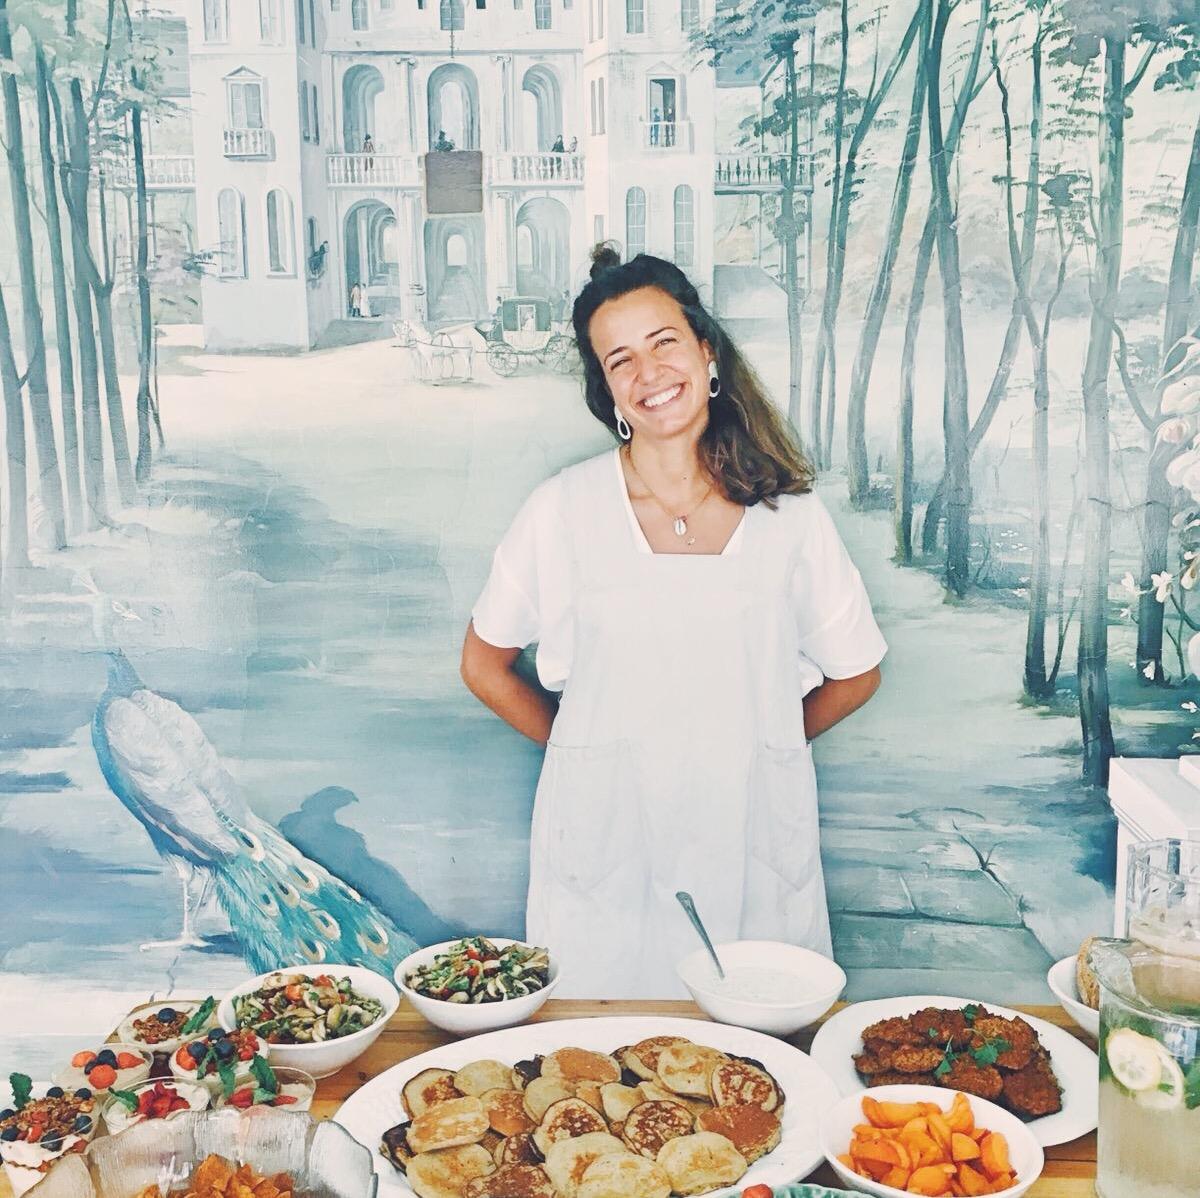 bachelorette workshop and brunch | please consider | joana limao